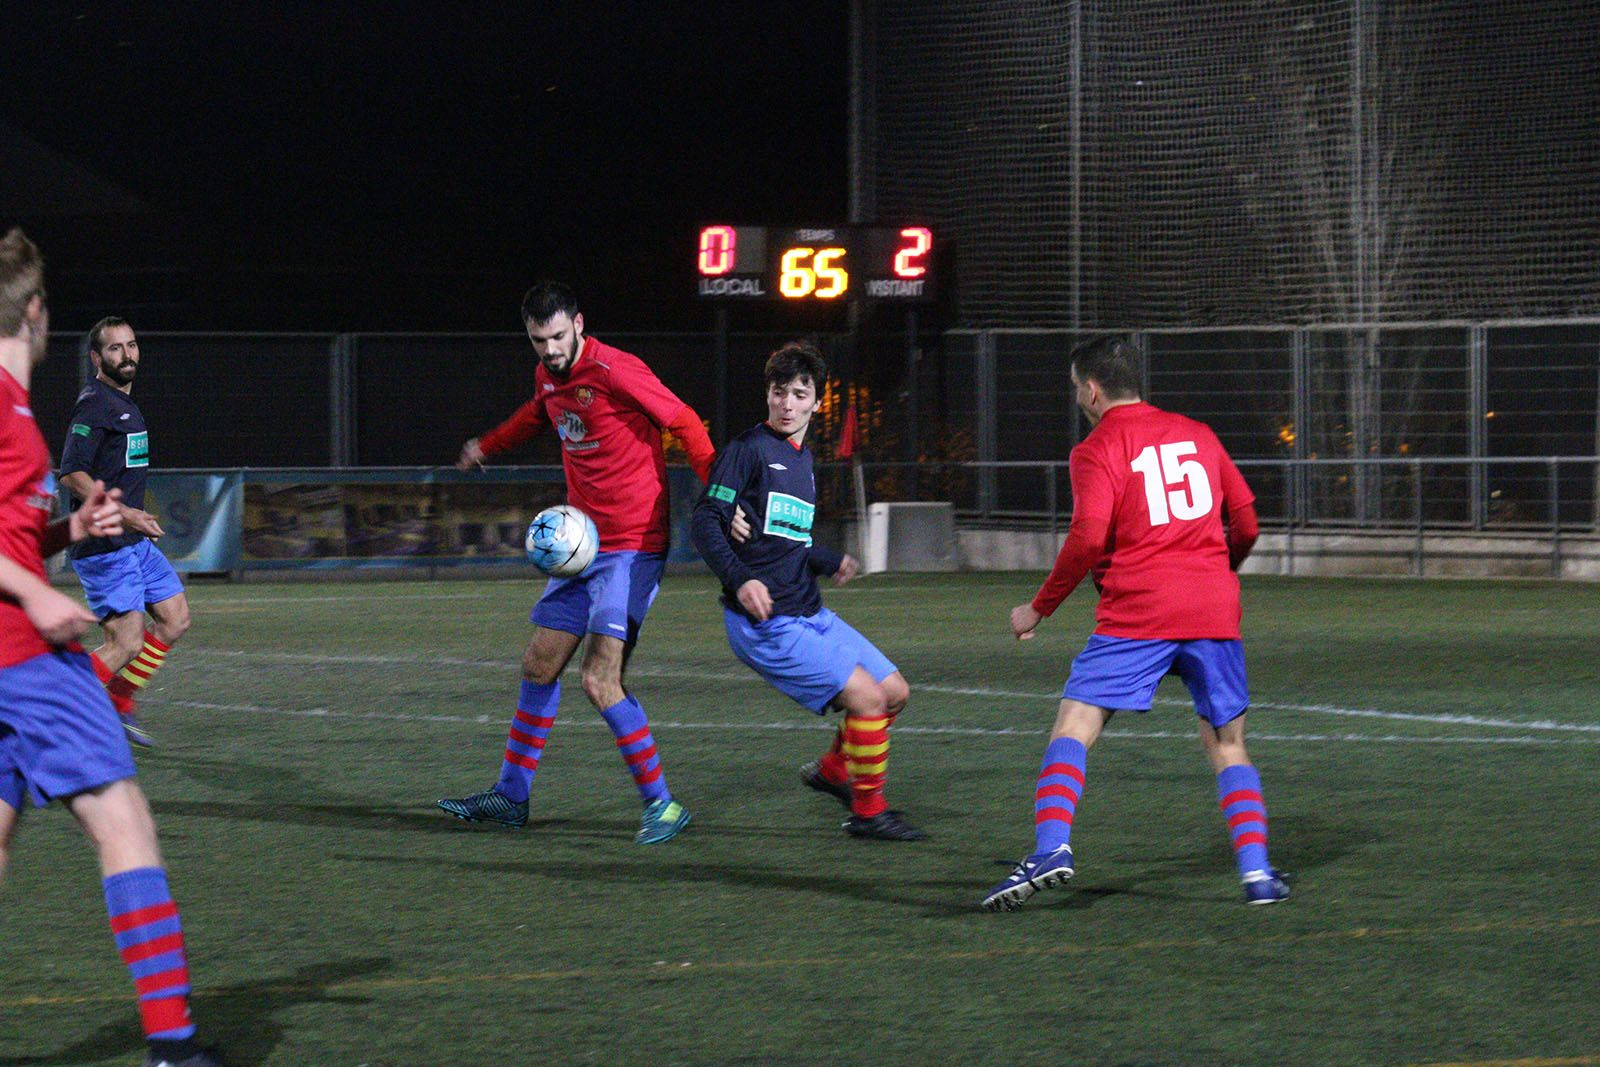 Lliga de futbol: Penya Blaugrana Sant Cugat-UE Tona B. Foto: Lali Álvarez